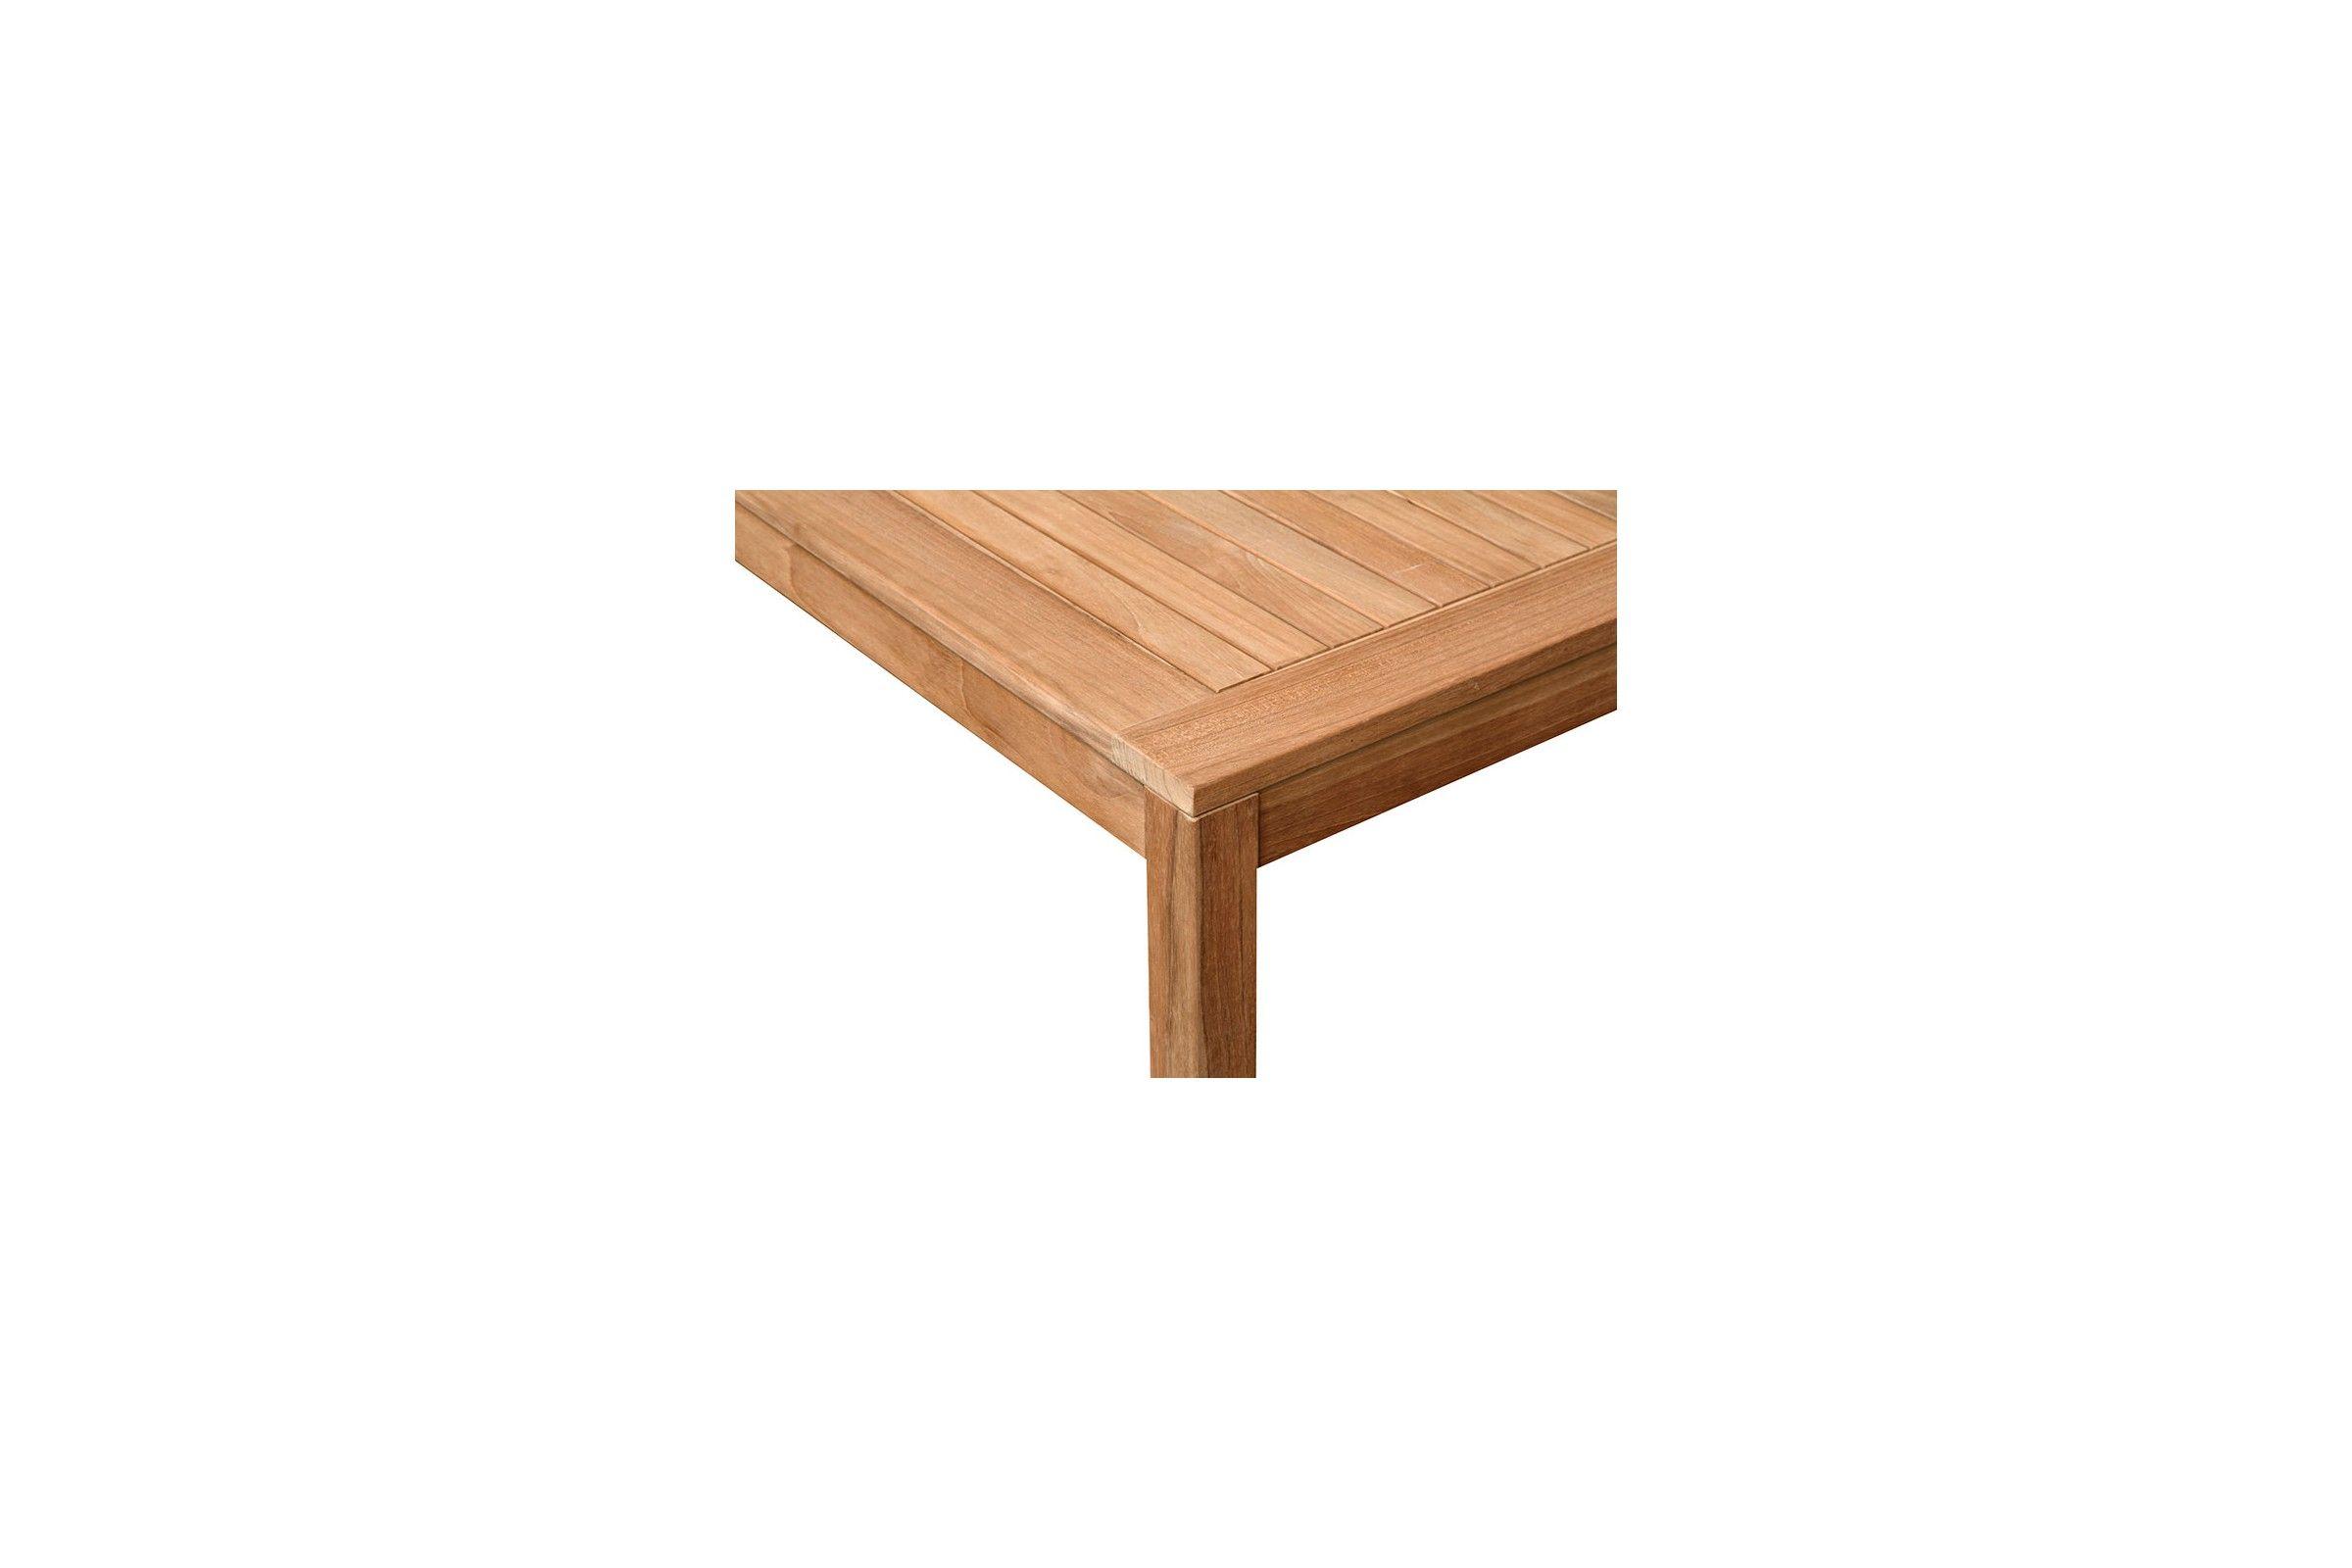 Table de jardin carrée en teck massif 80 ou 90 cm, Calida